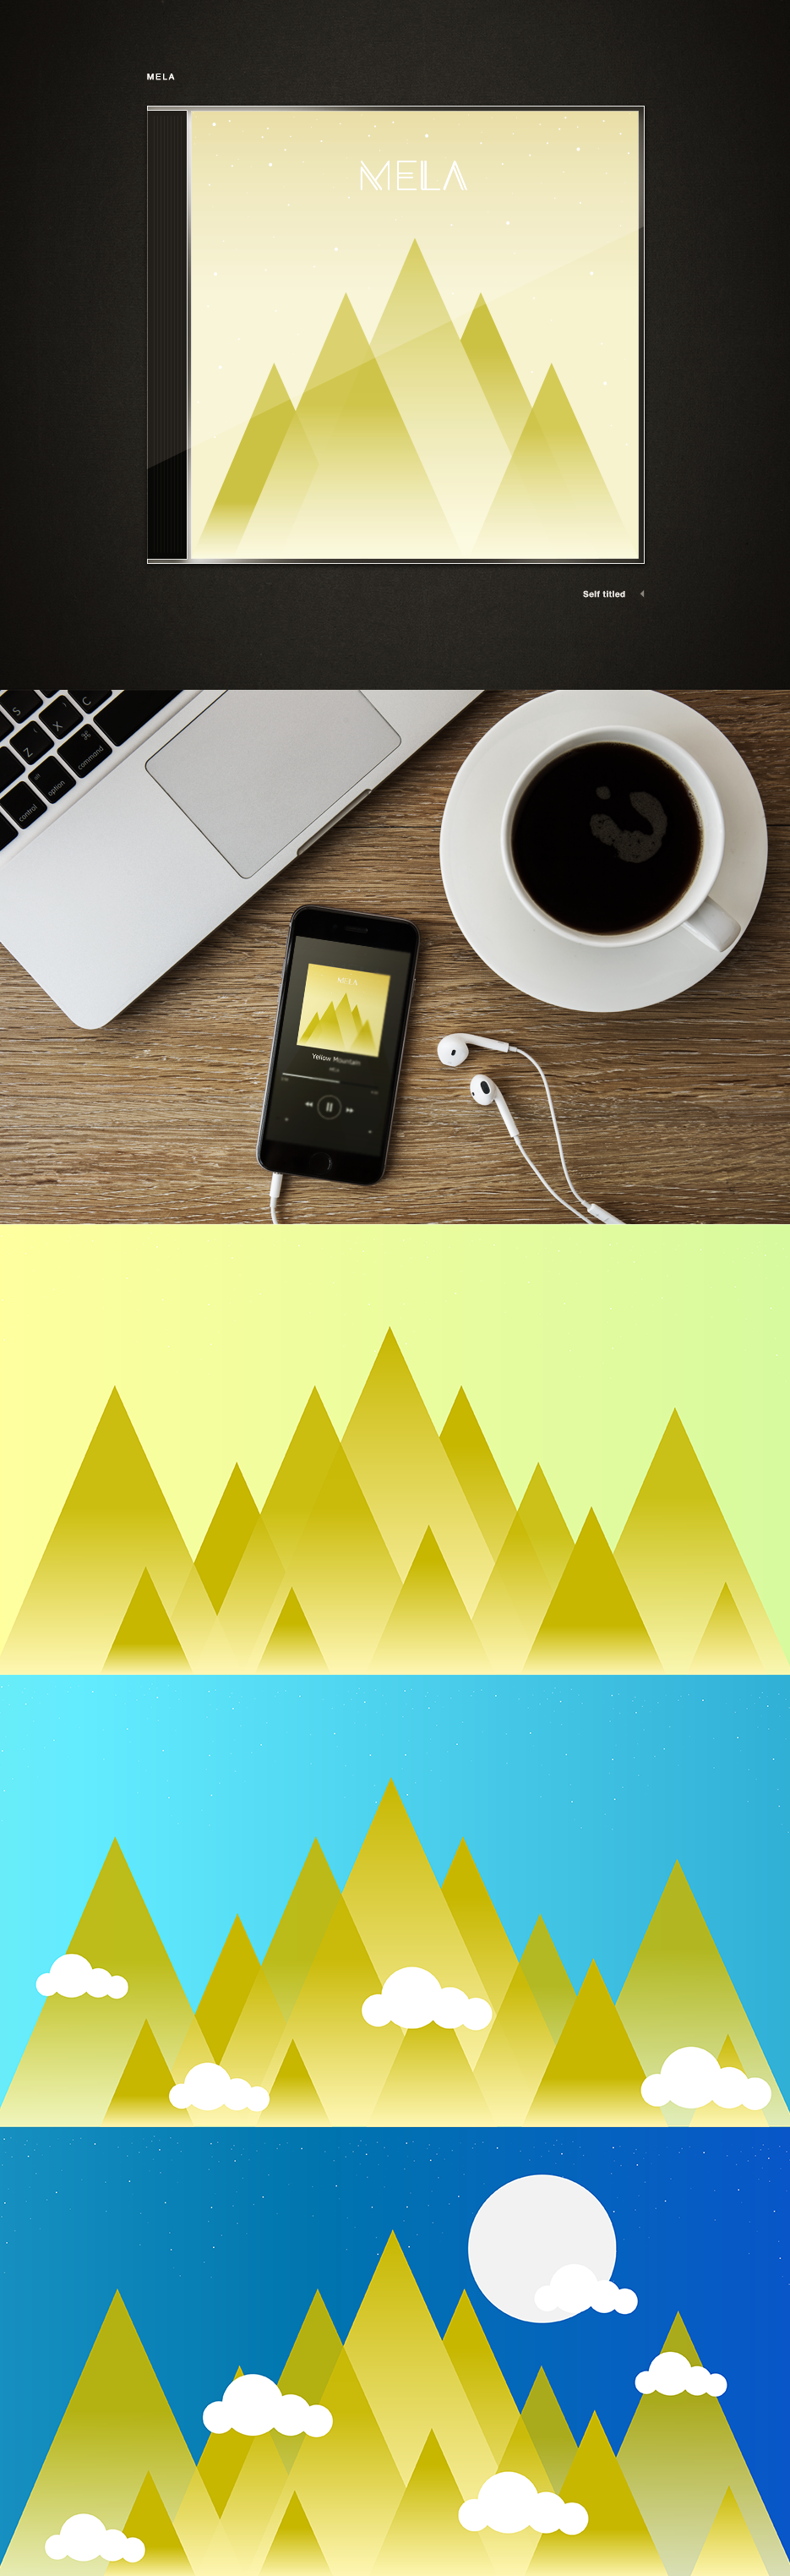 Illustrative design flat flat 2.0 vector artwork Album